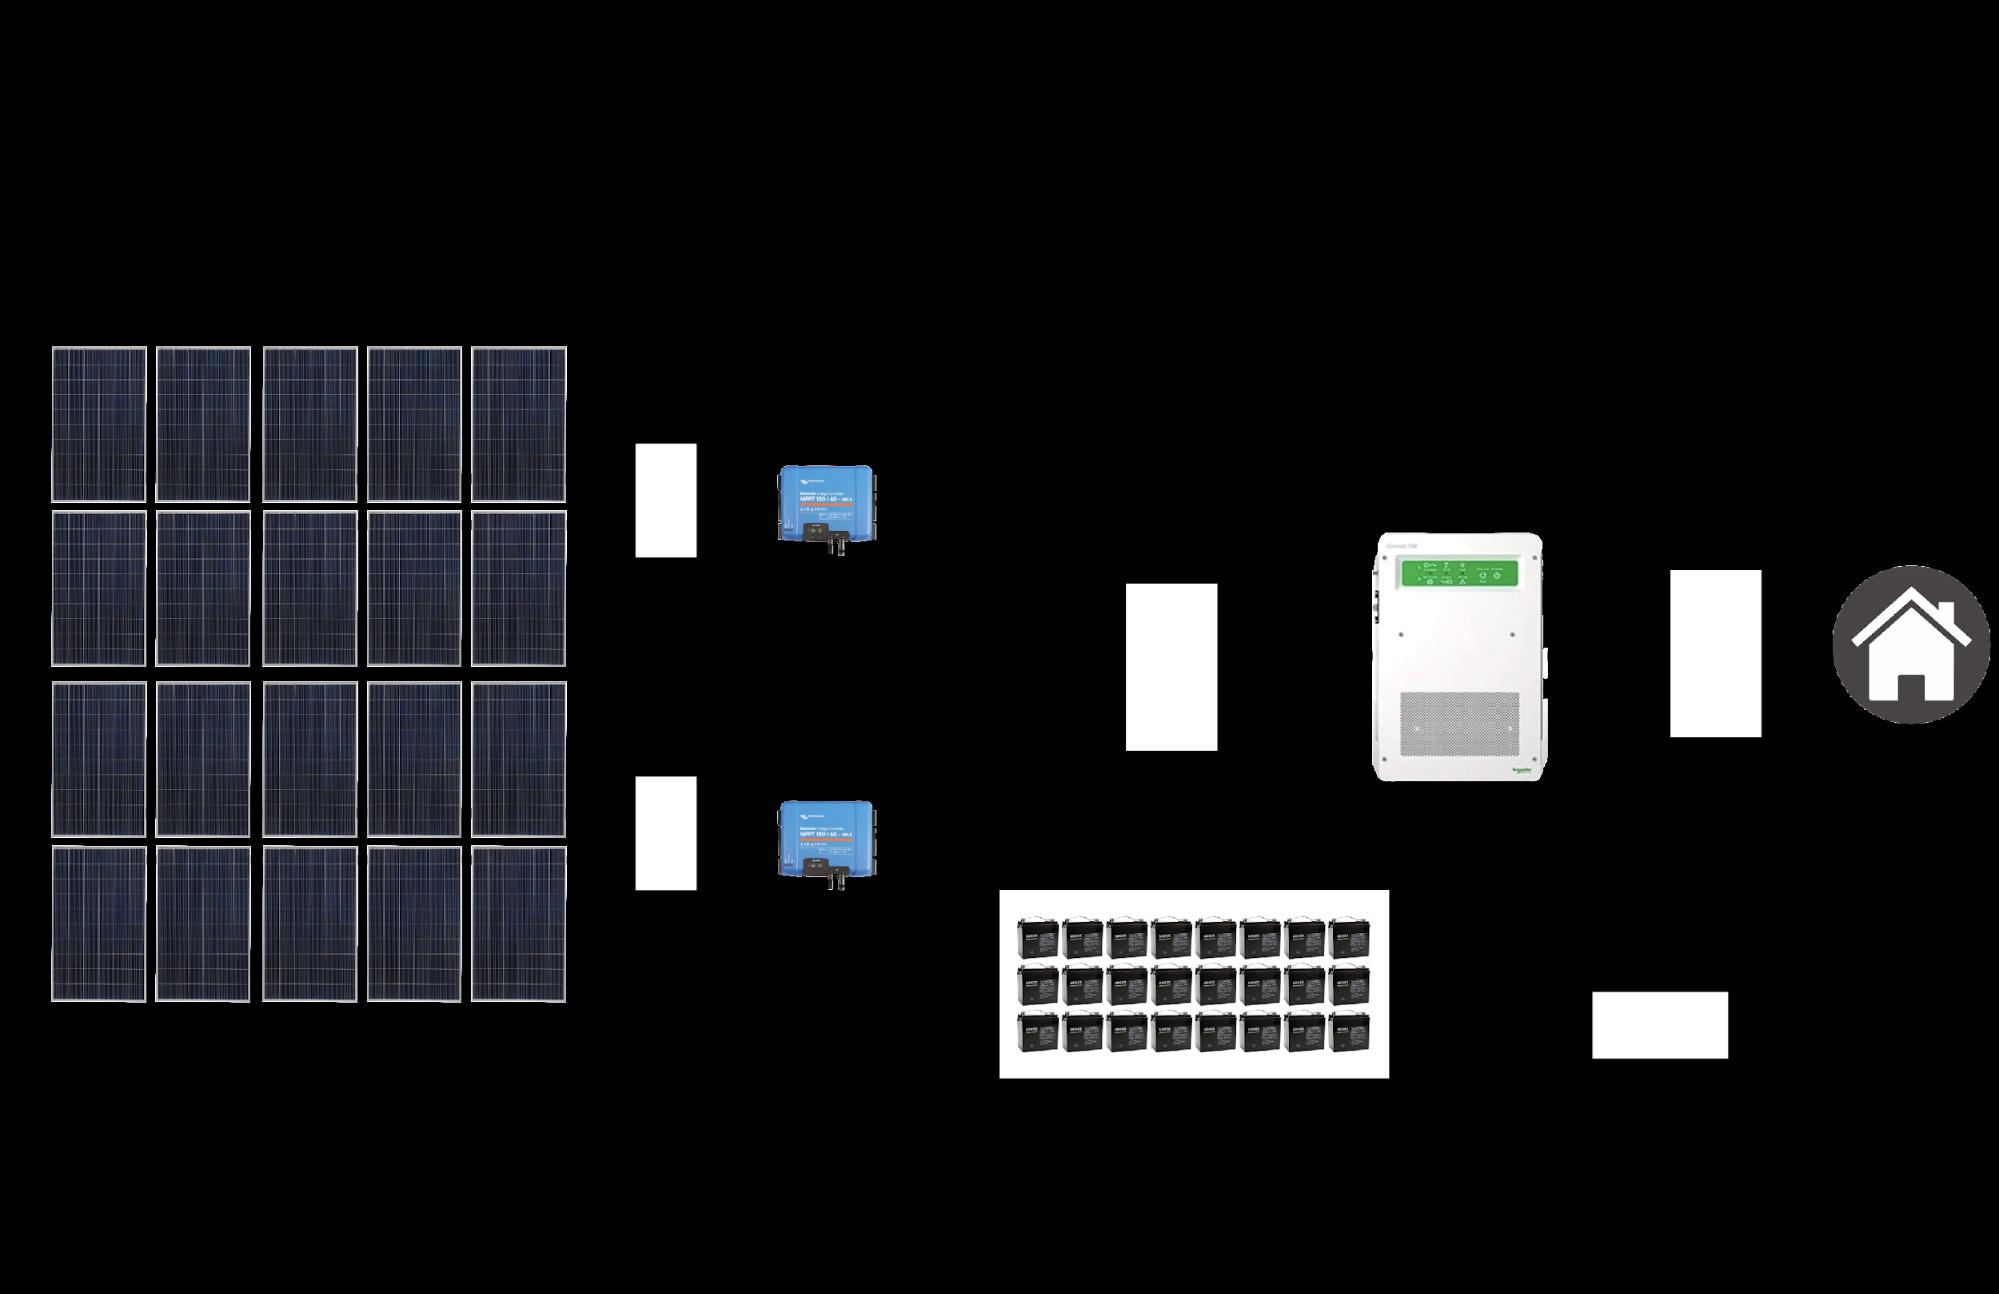 Off-grid 6.0 technical details